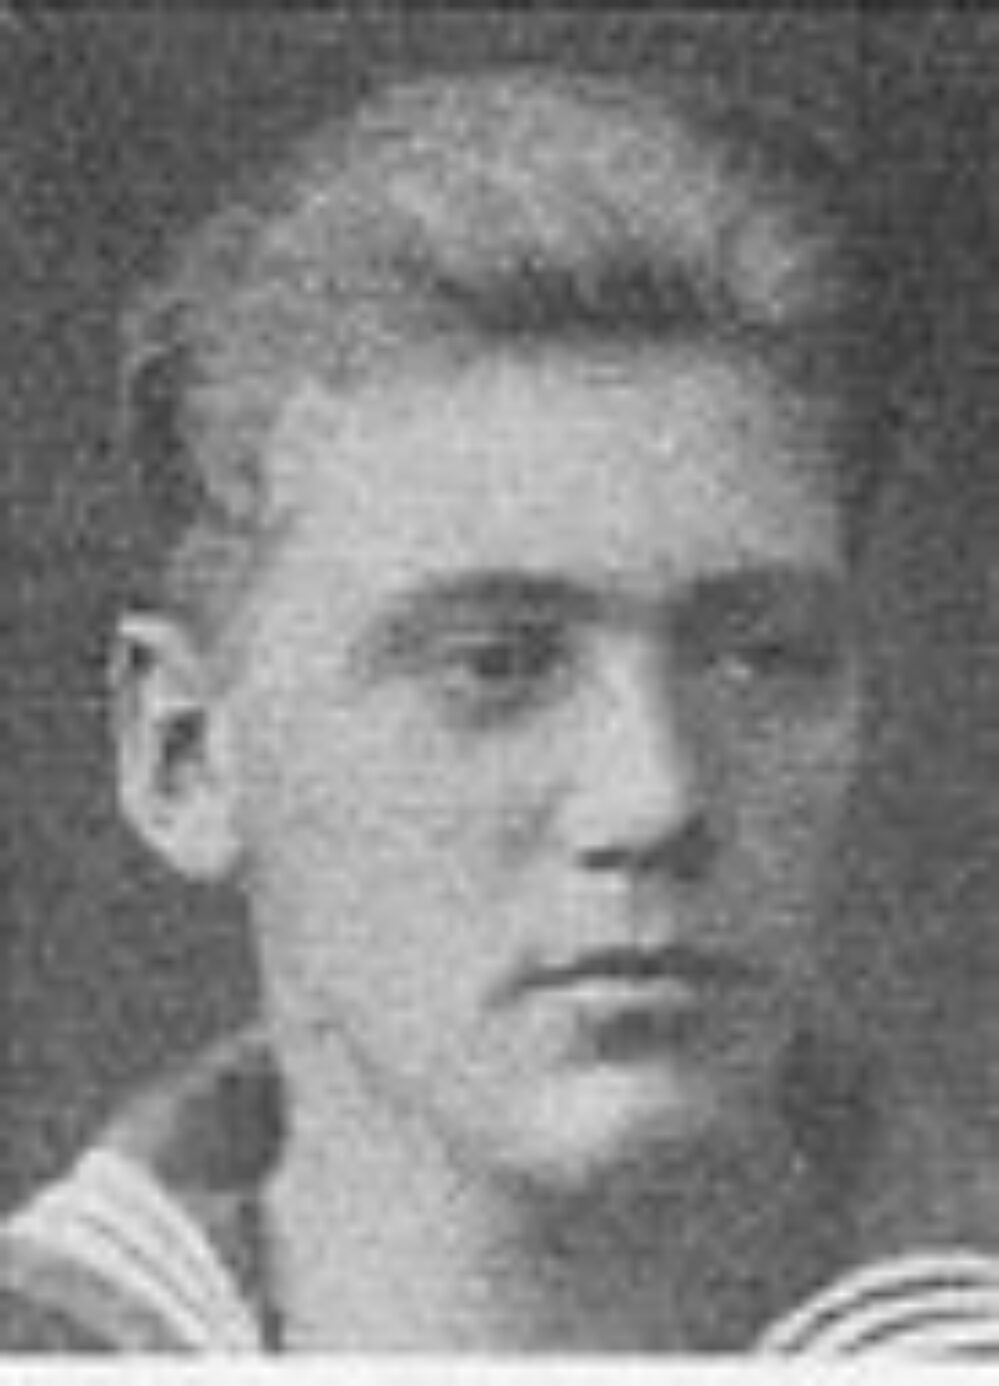 Ragnar Asbjørn Olsen